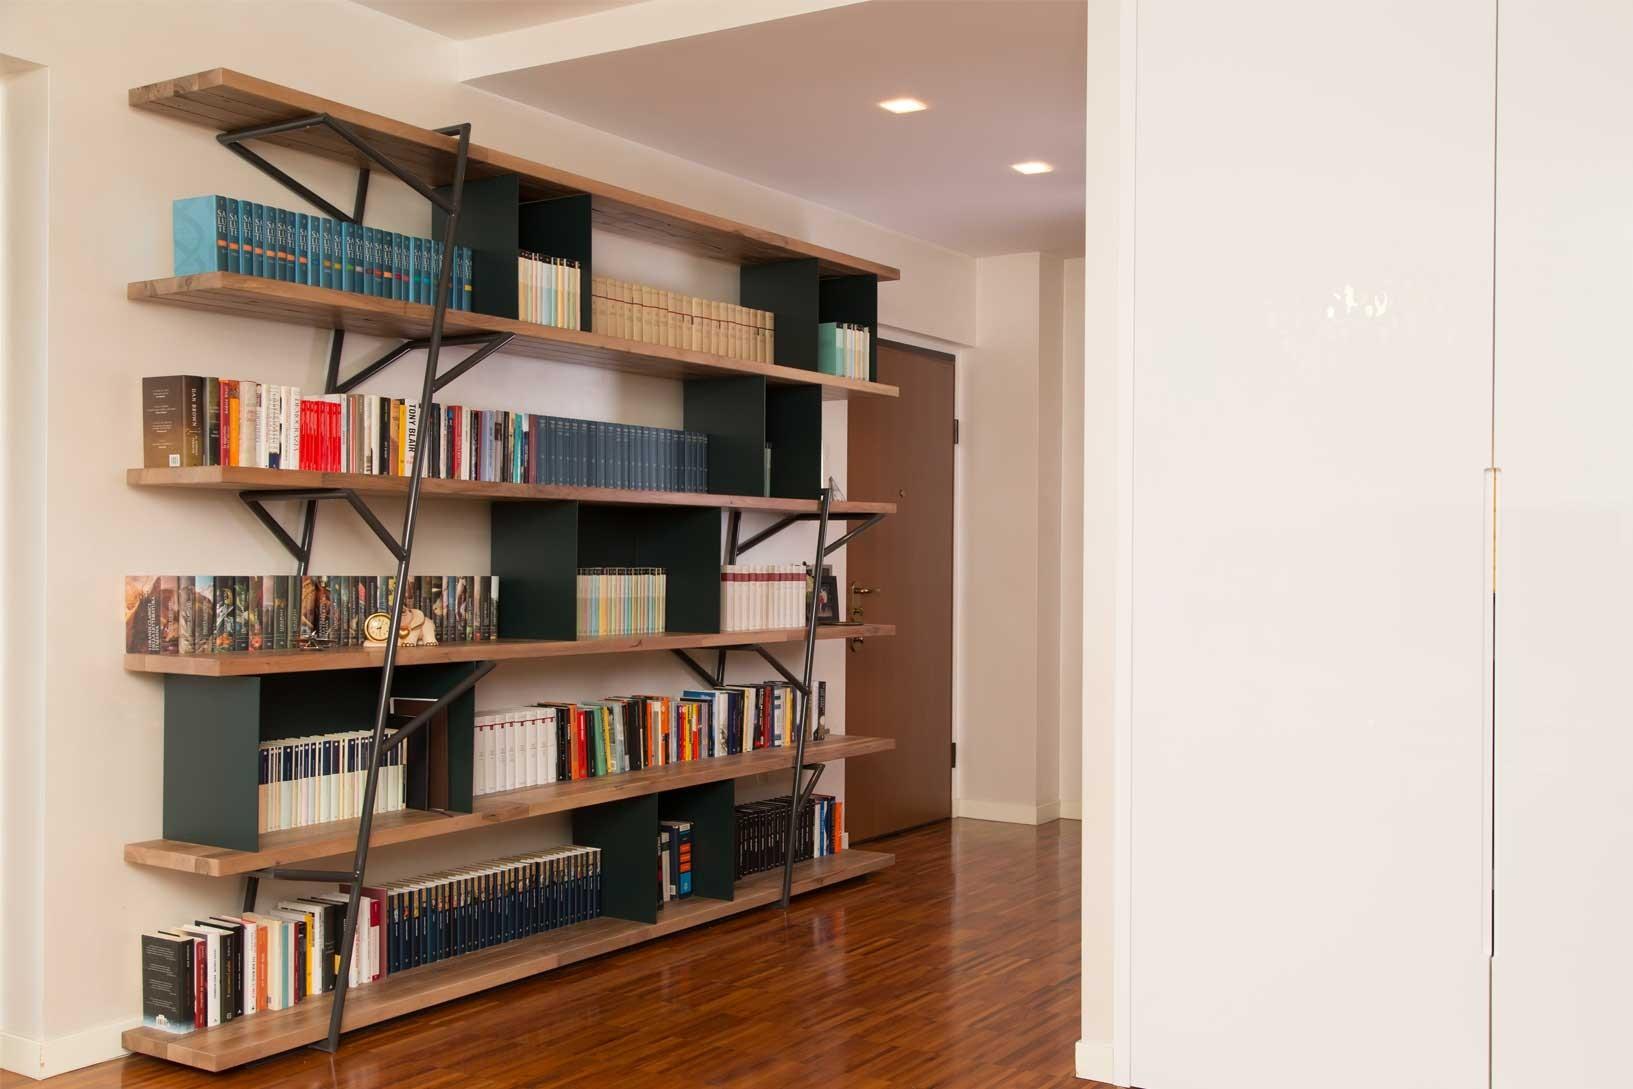 Logshelf libreria for Libreria in ferro